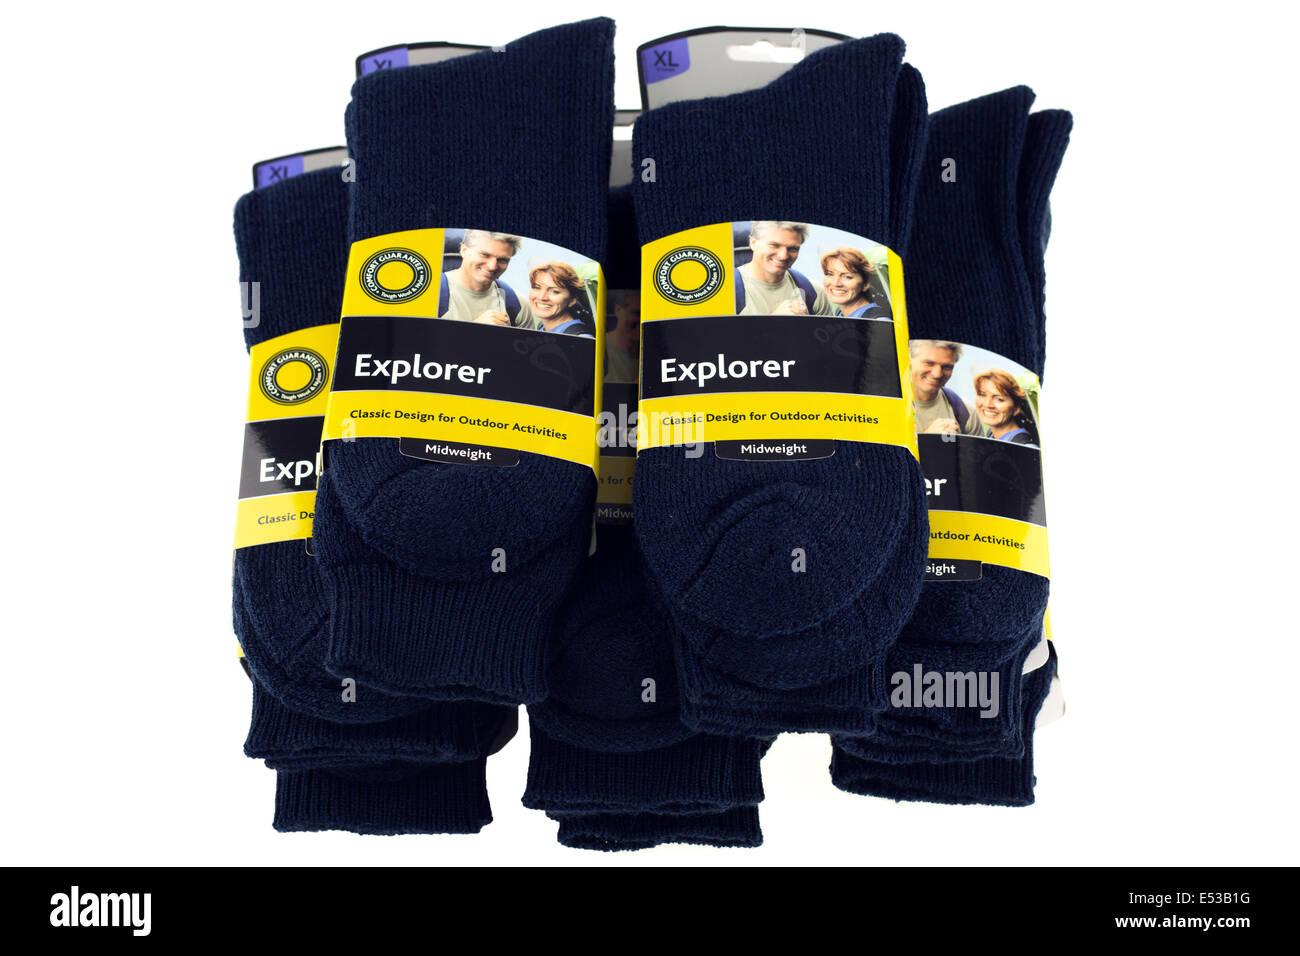 Pila di grande blu Bridgedale mens Explorer di paia di calze di lana e nylon Foto Stock